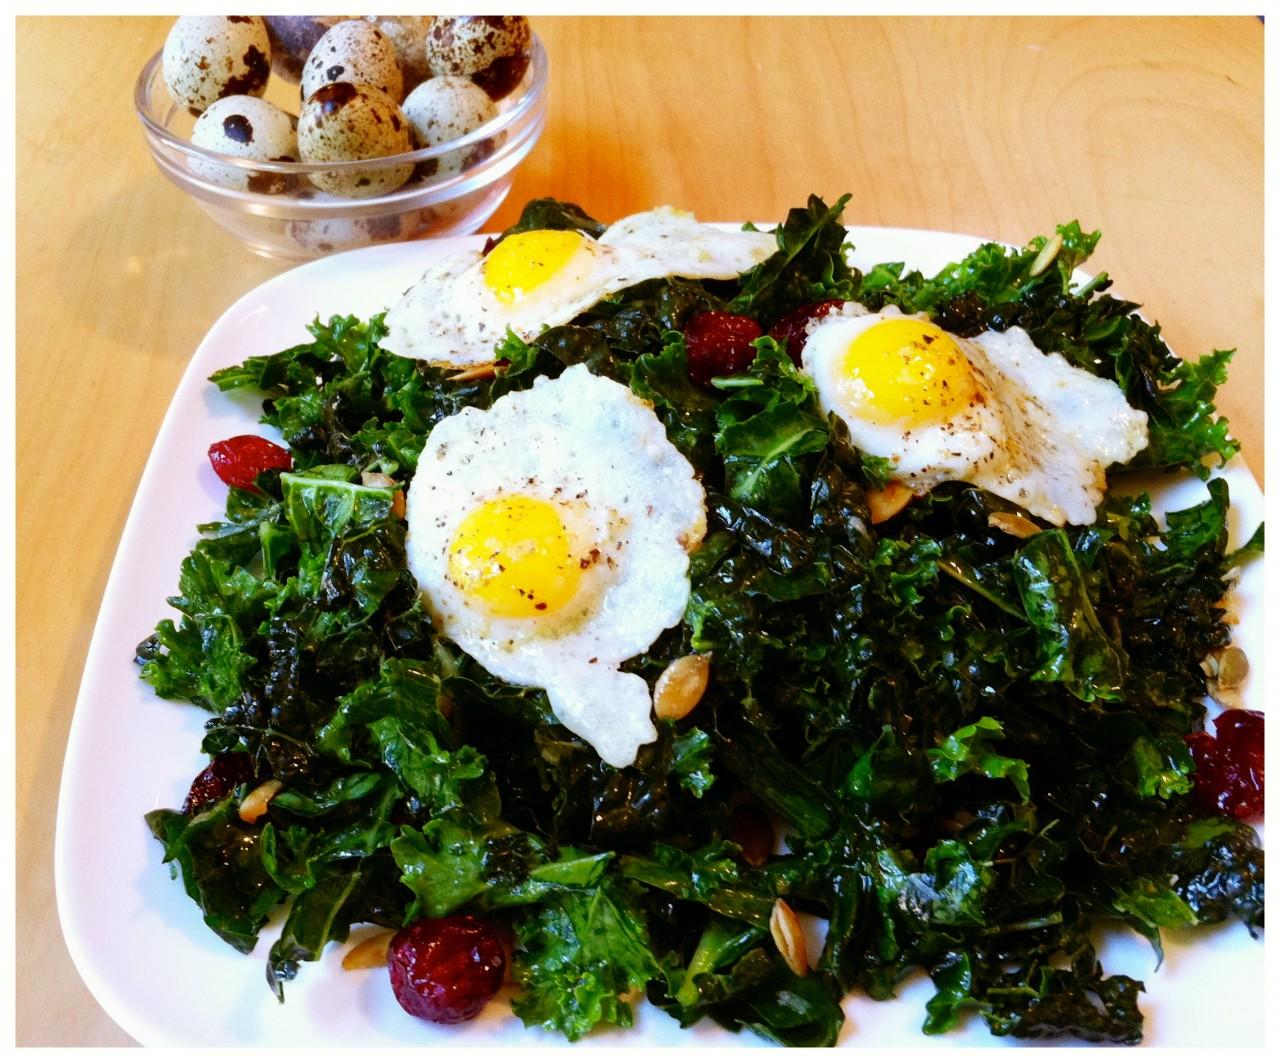 kale salad with quail eggs